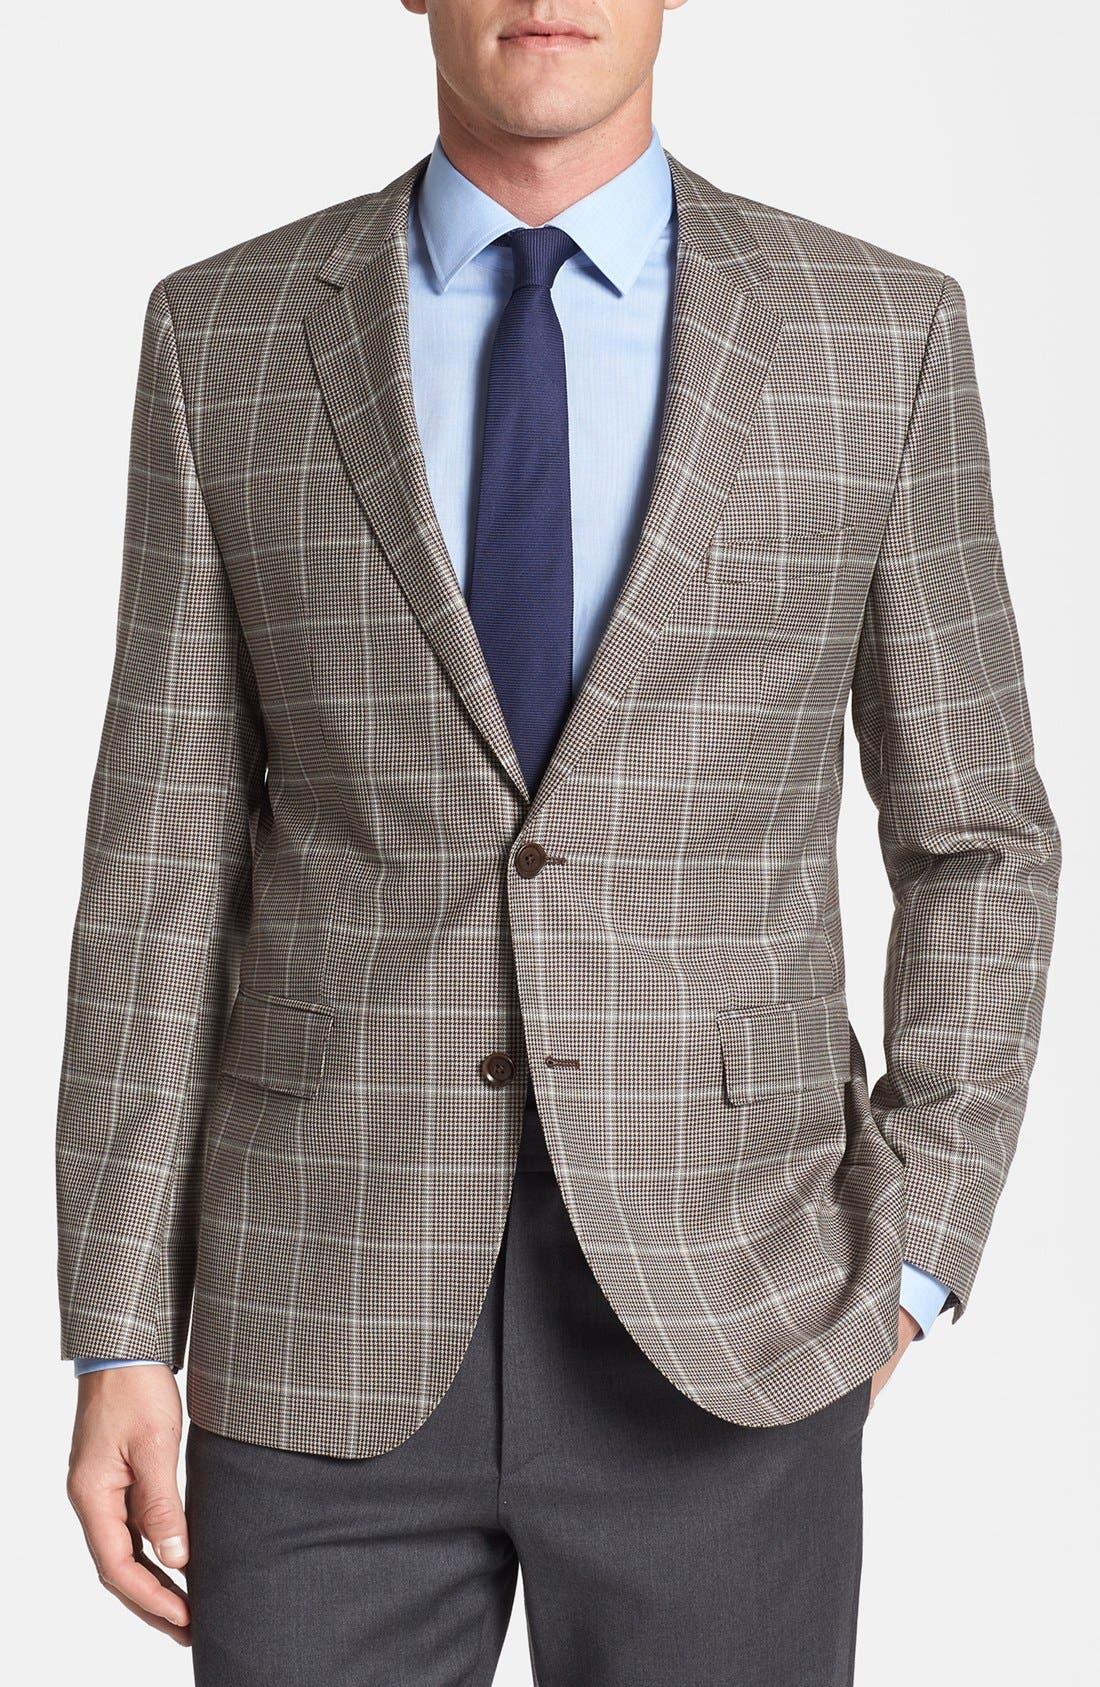 Main Image - BOSS HUGO BOSS 'The Smith' Trim Fit Plaid Sportcoat